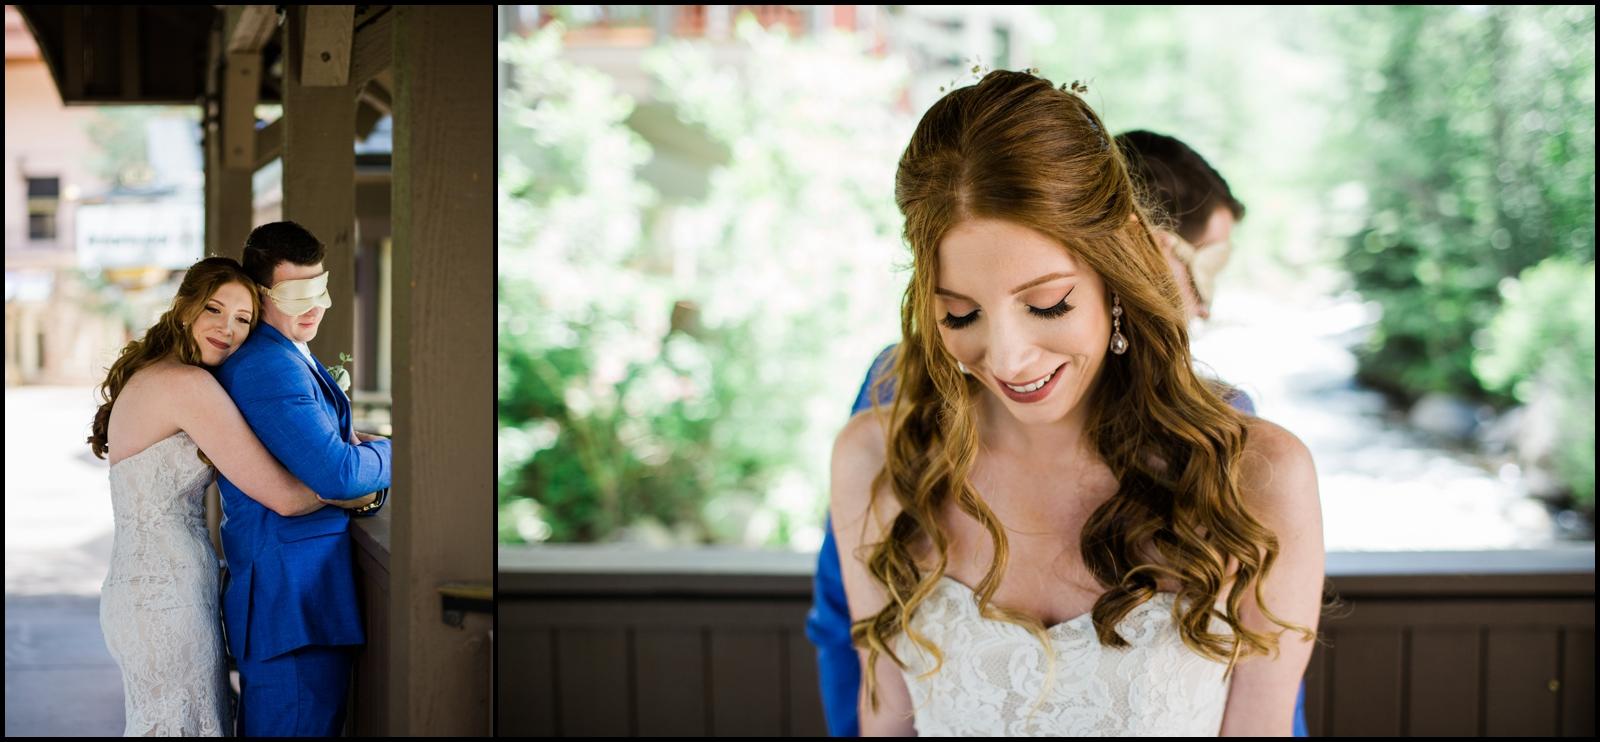 Bride and groom before their wedding in Denver